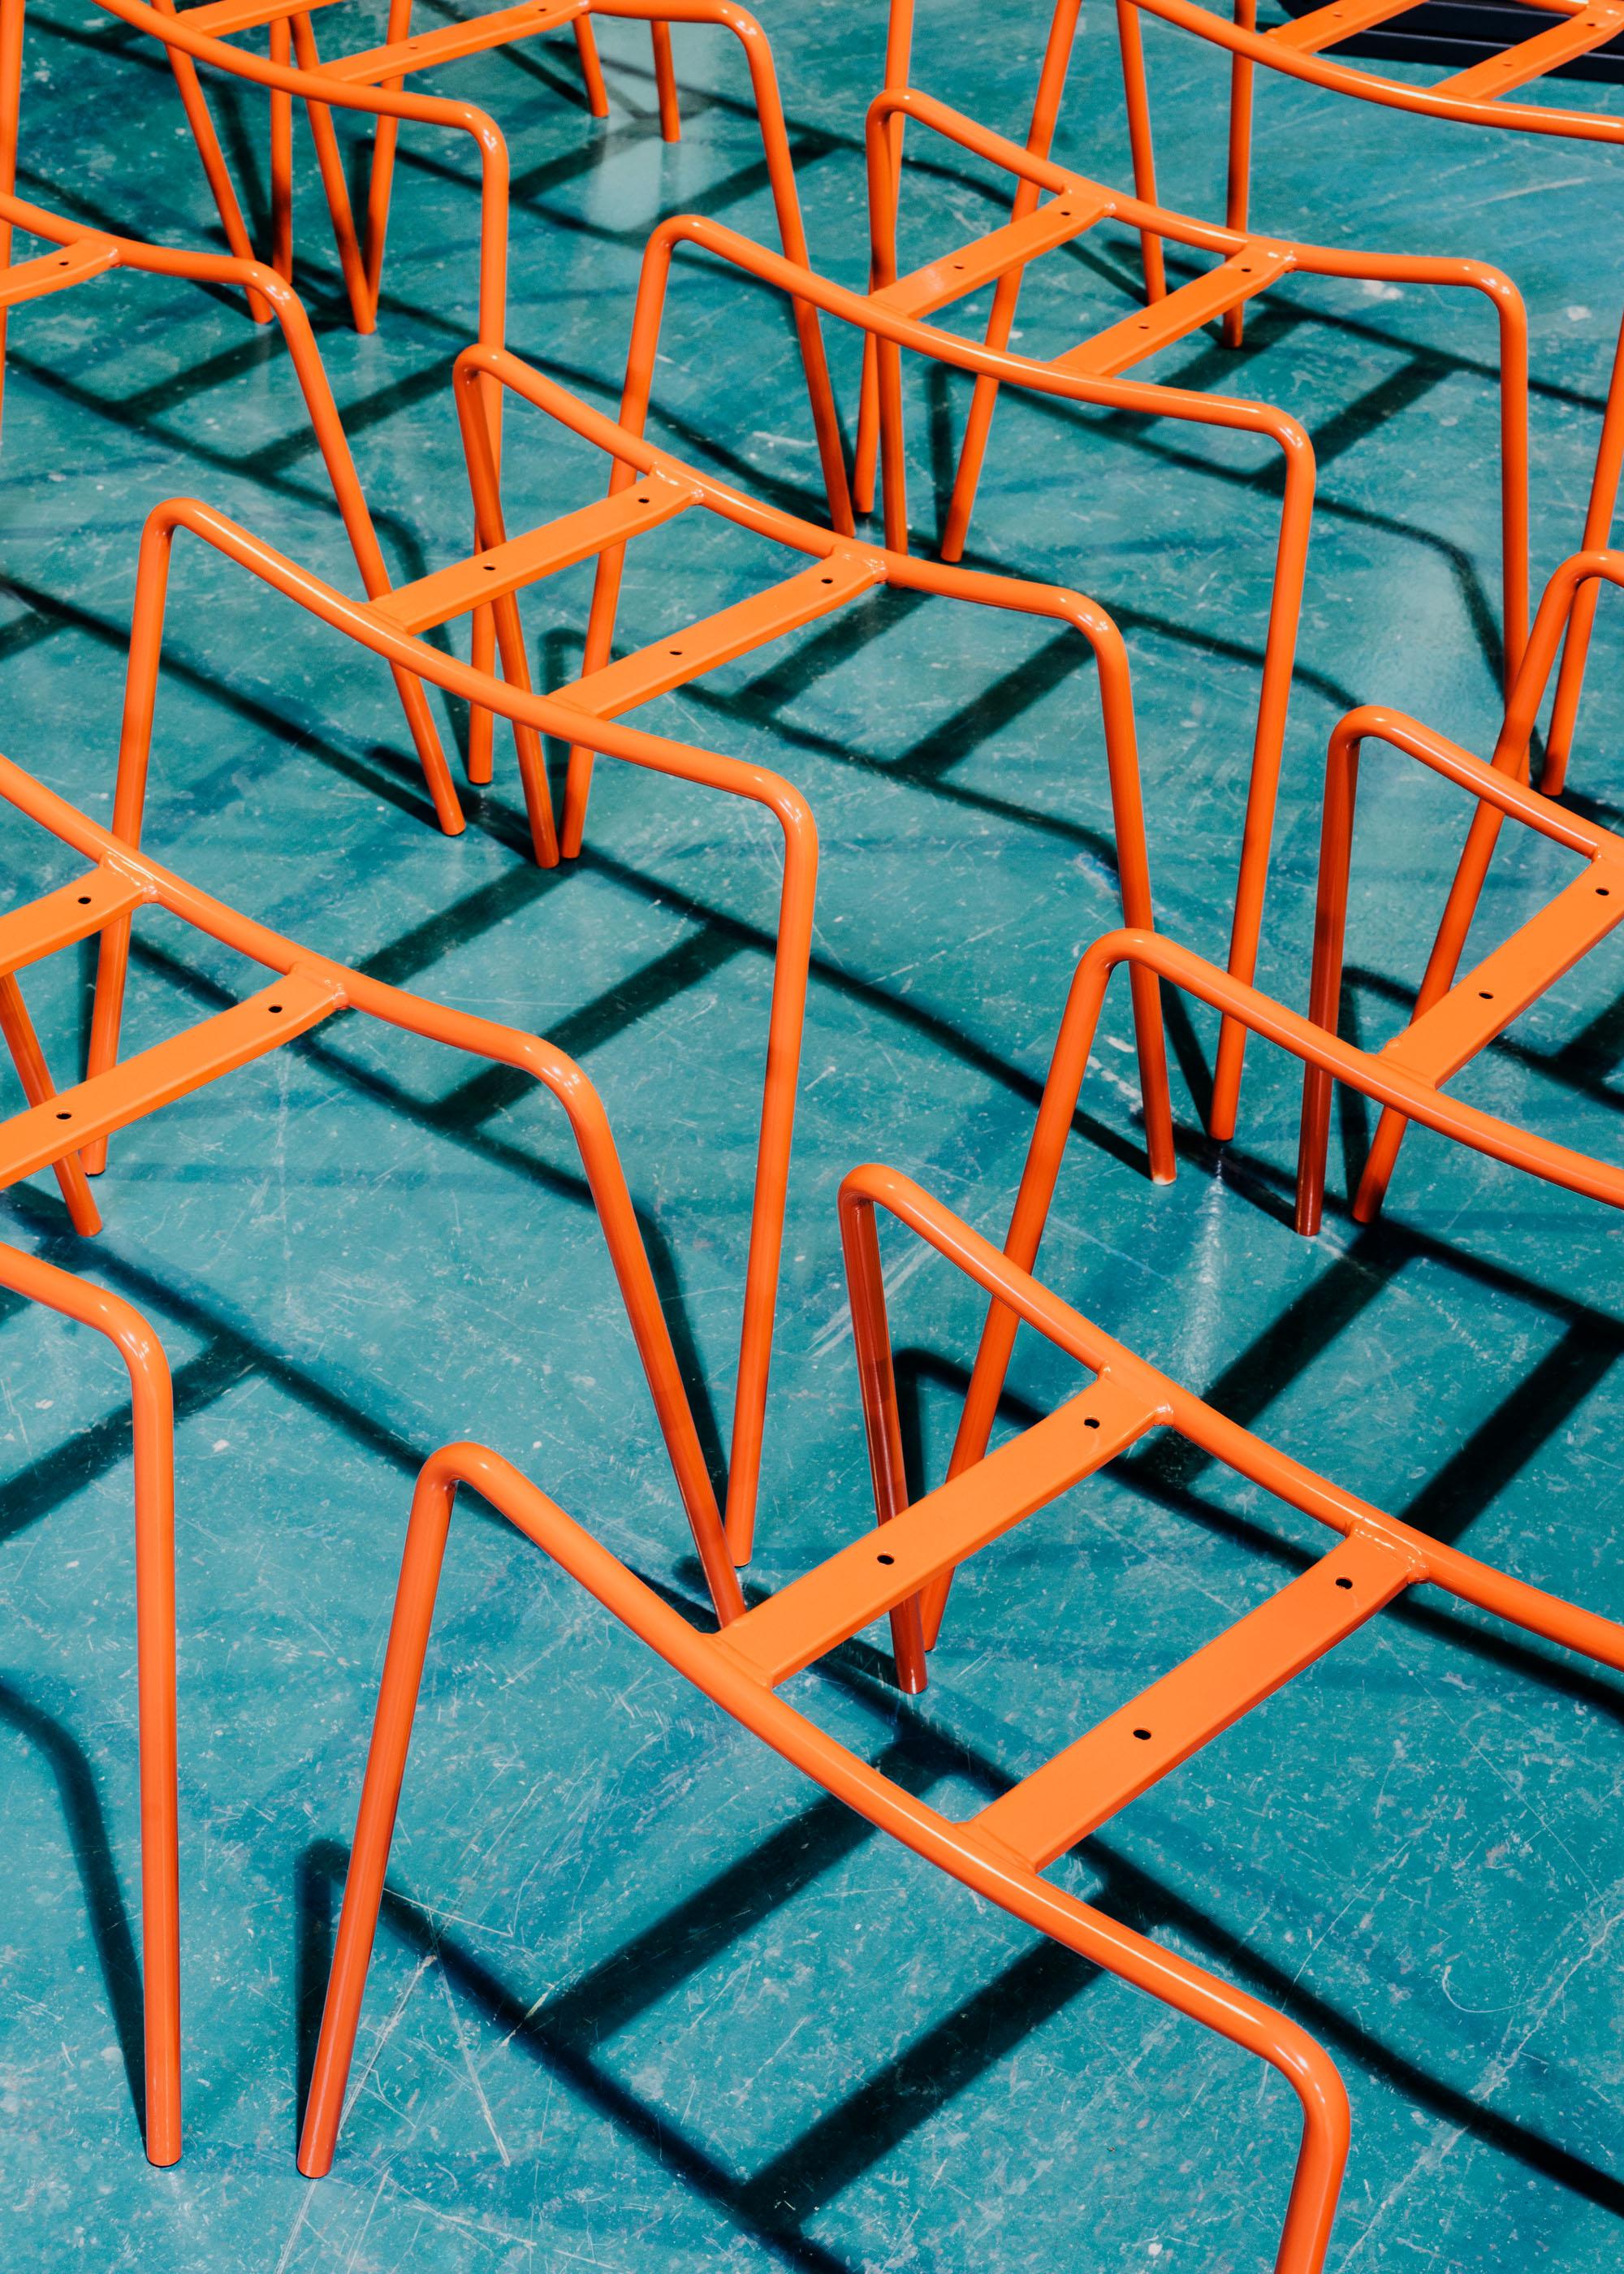 #furniture #enea #design #clase #basque #industry #chairs #orange #factory